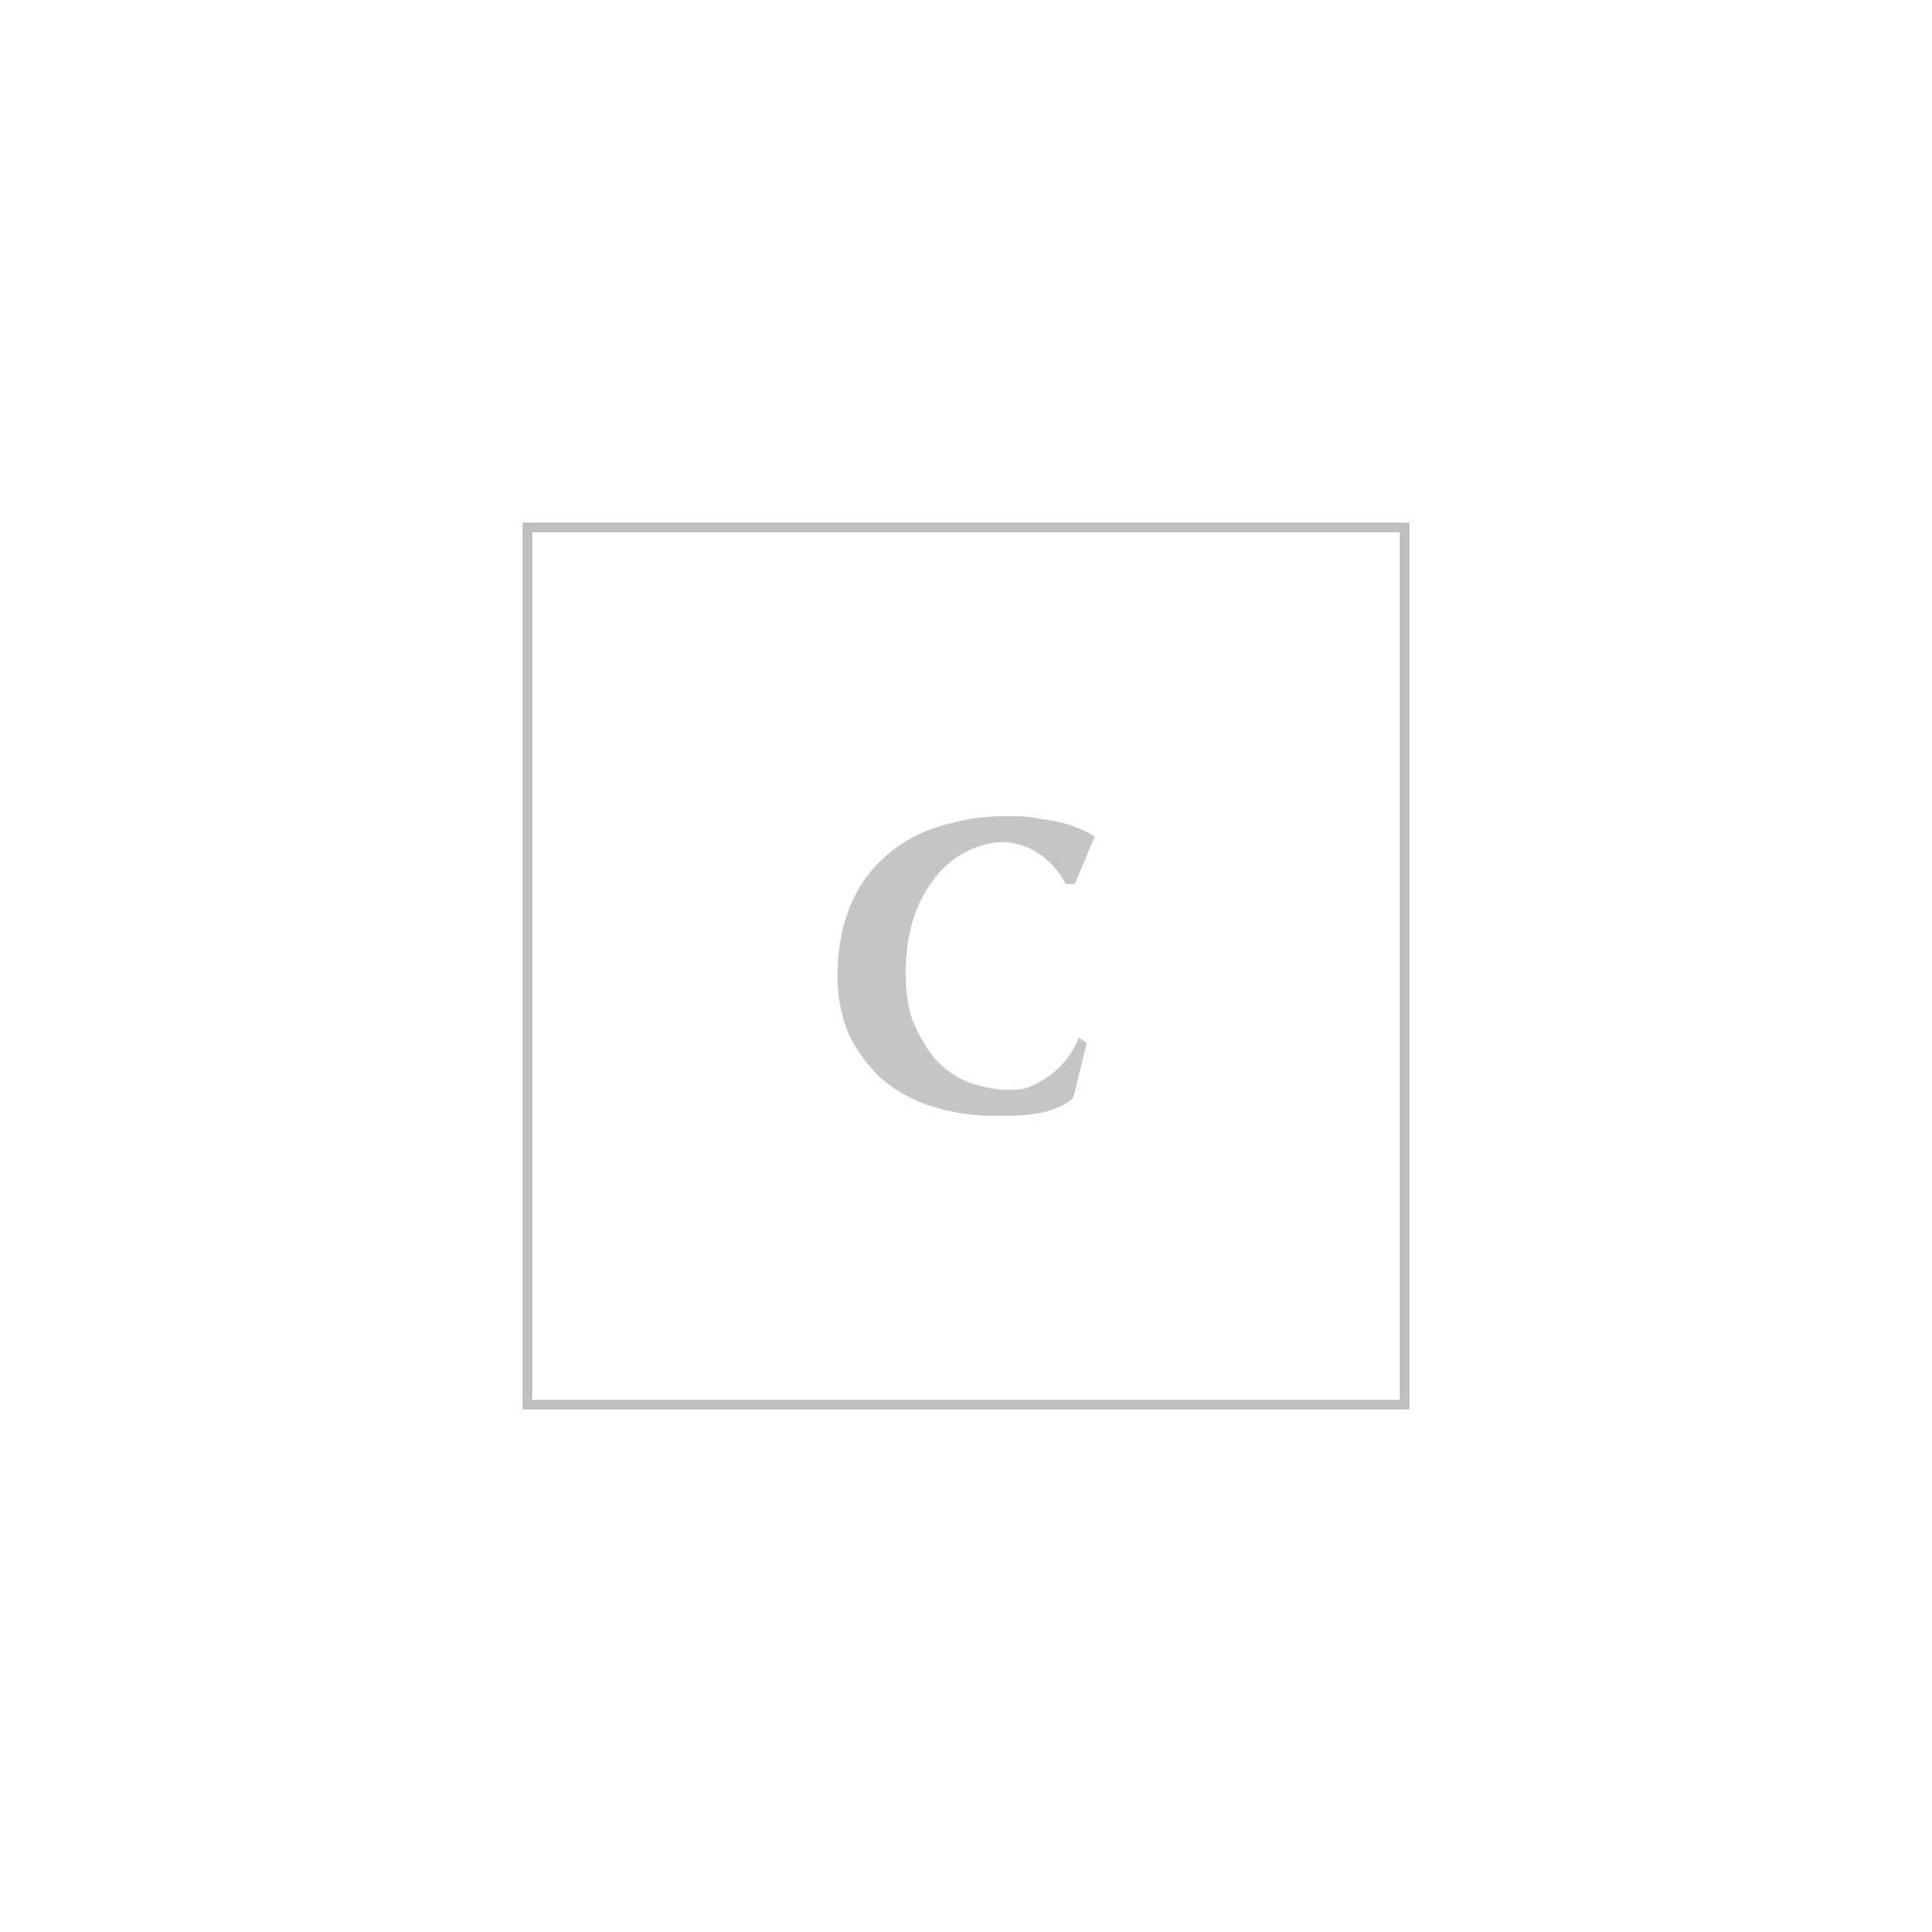 Borsello a tracolla check Burberry con logo